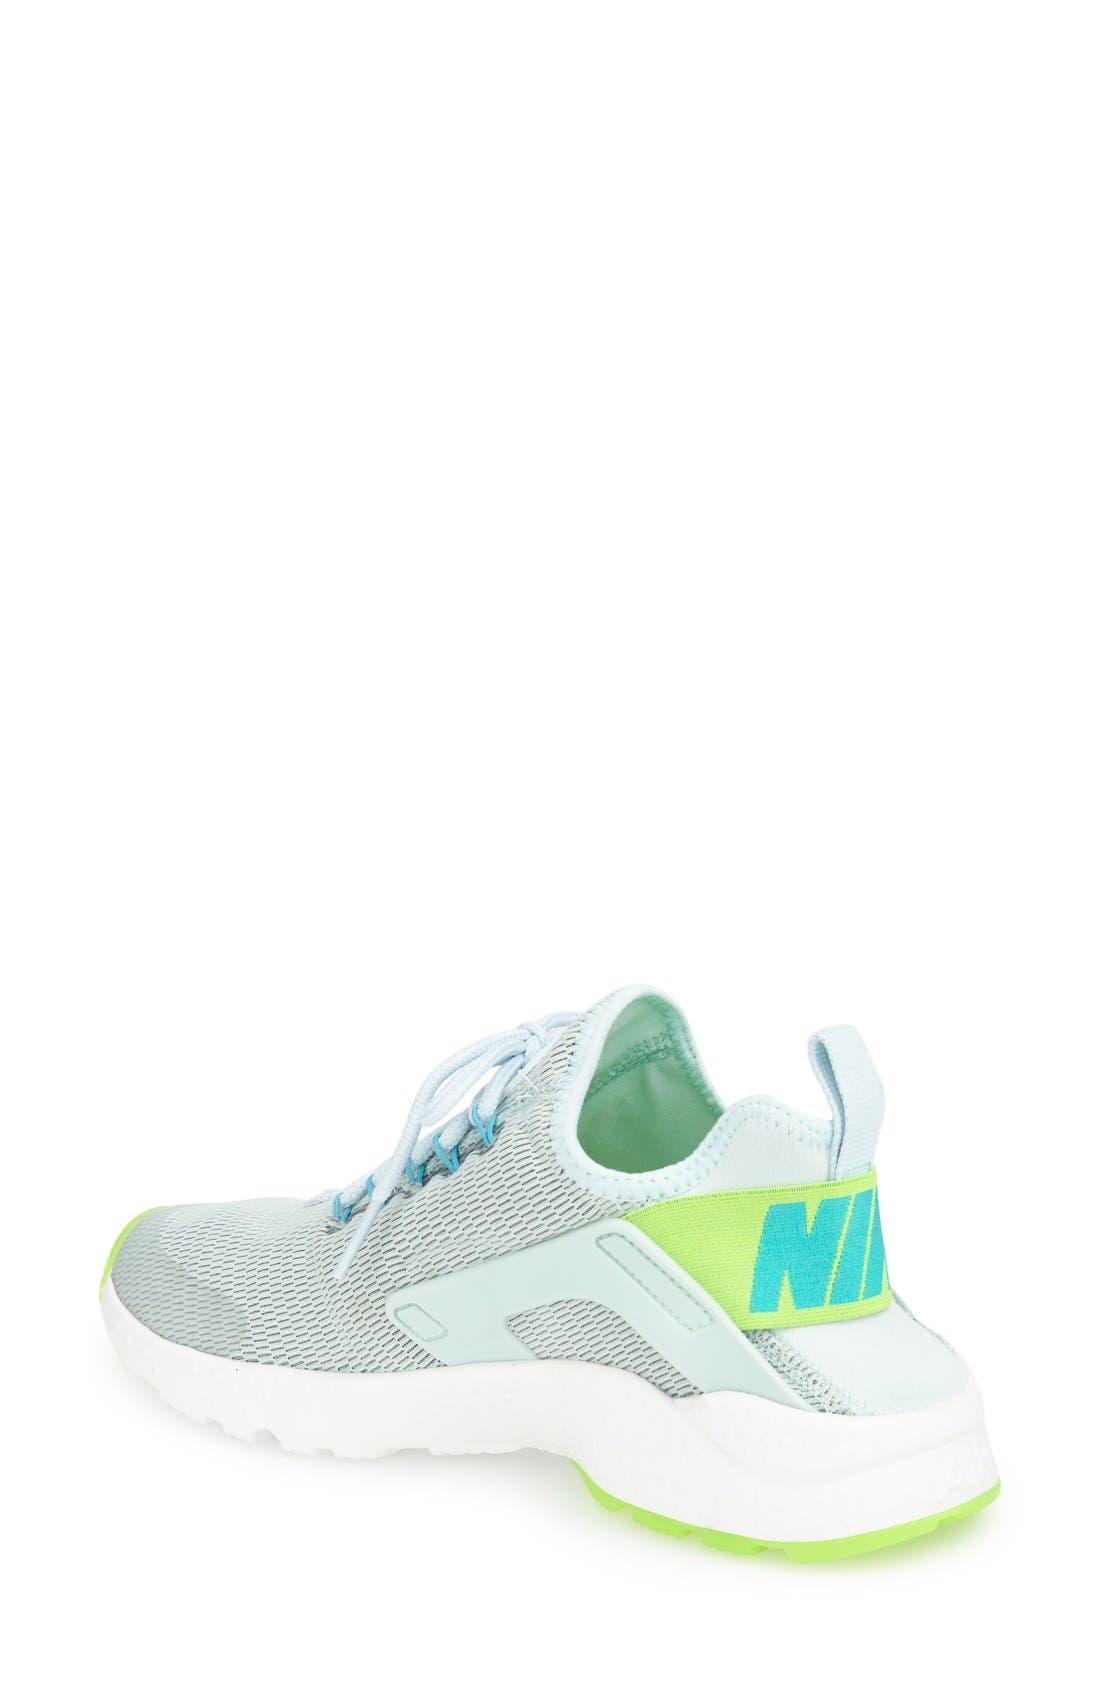 Air Huarache Sneaker,                             Alternate thumbnail 64, color,